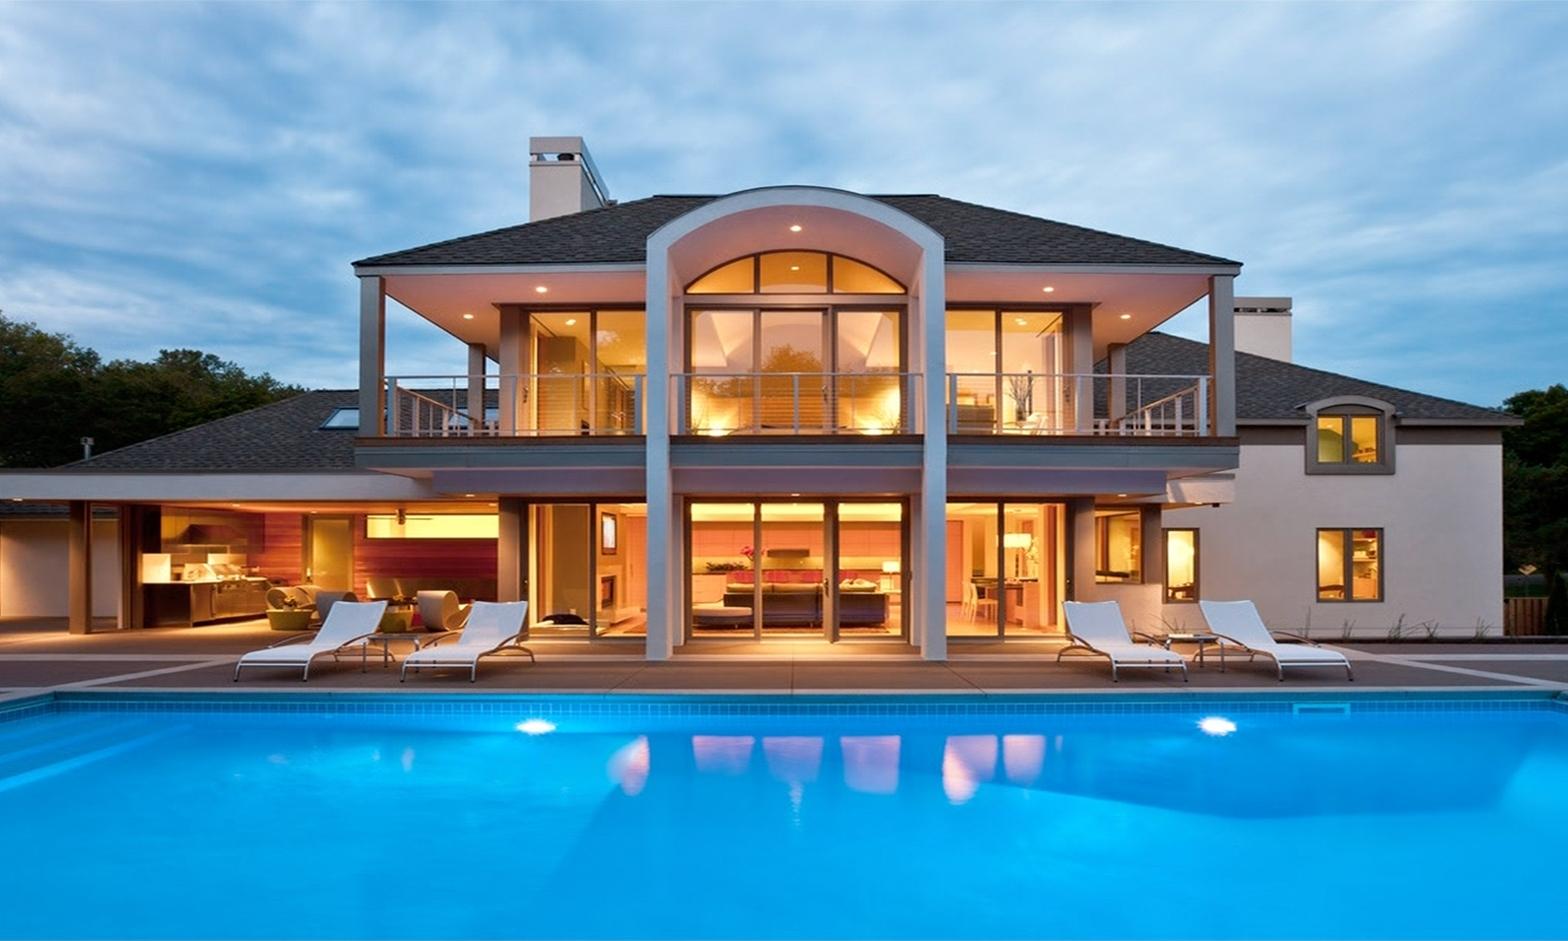 mendota heights residence -